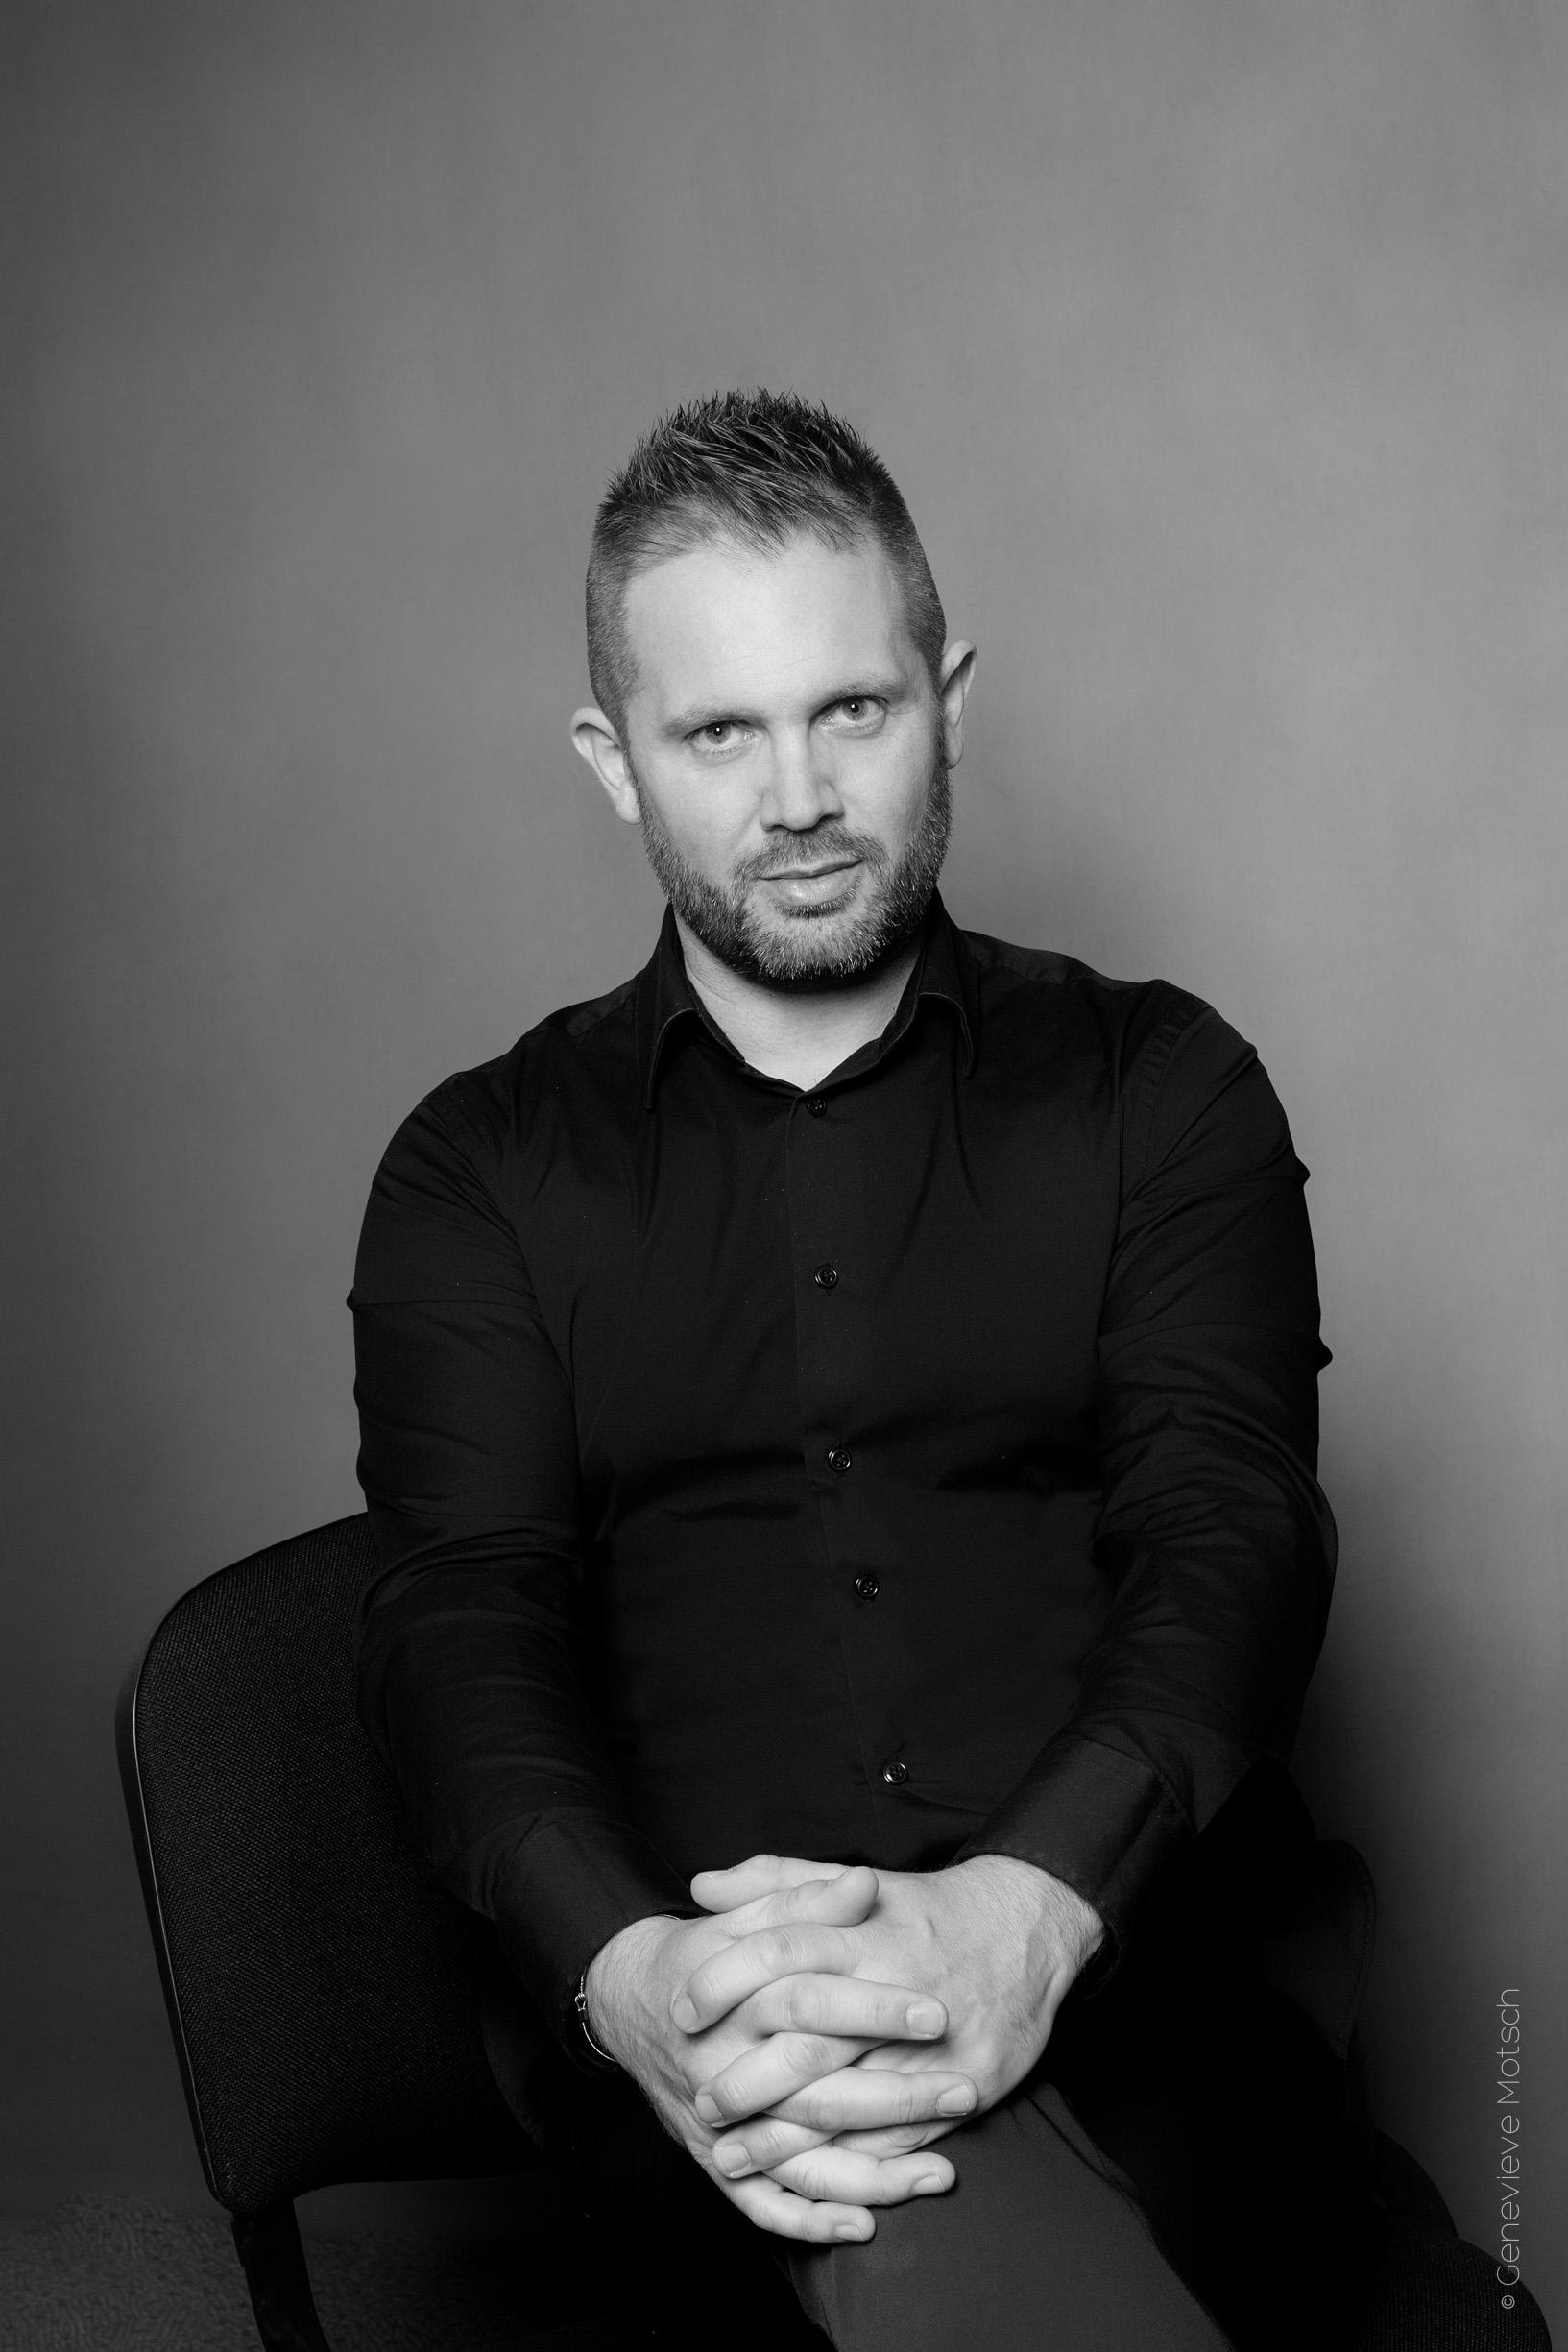 Nicolas-Yves CAYROL